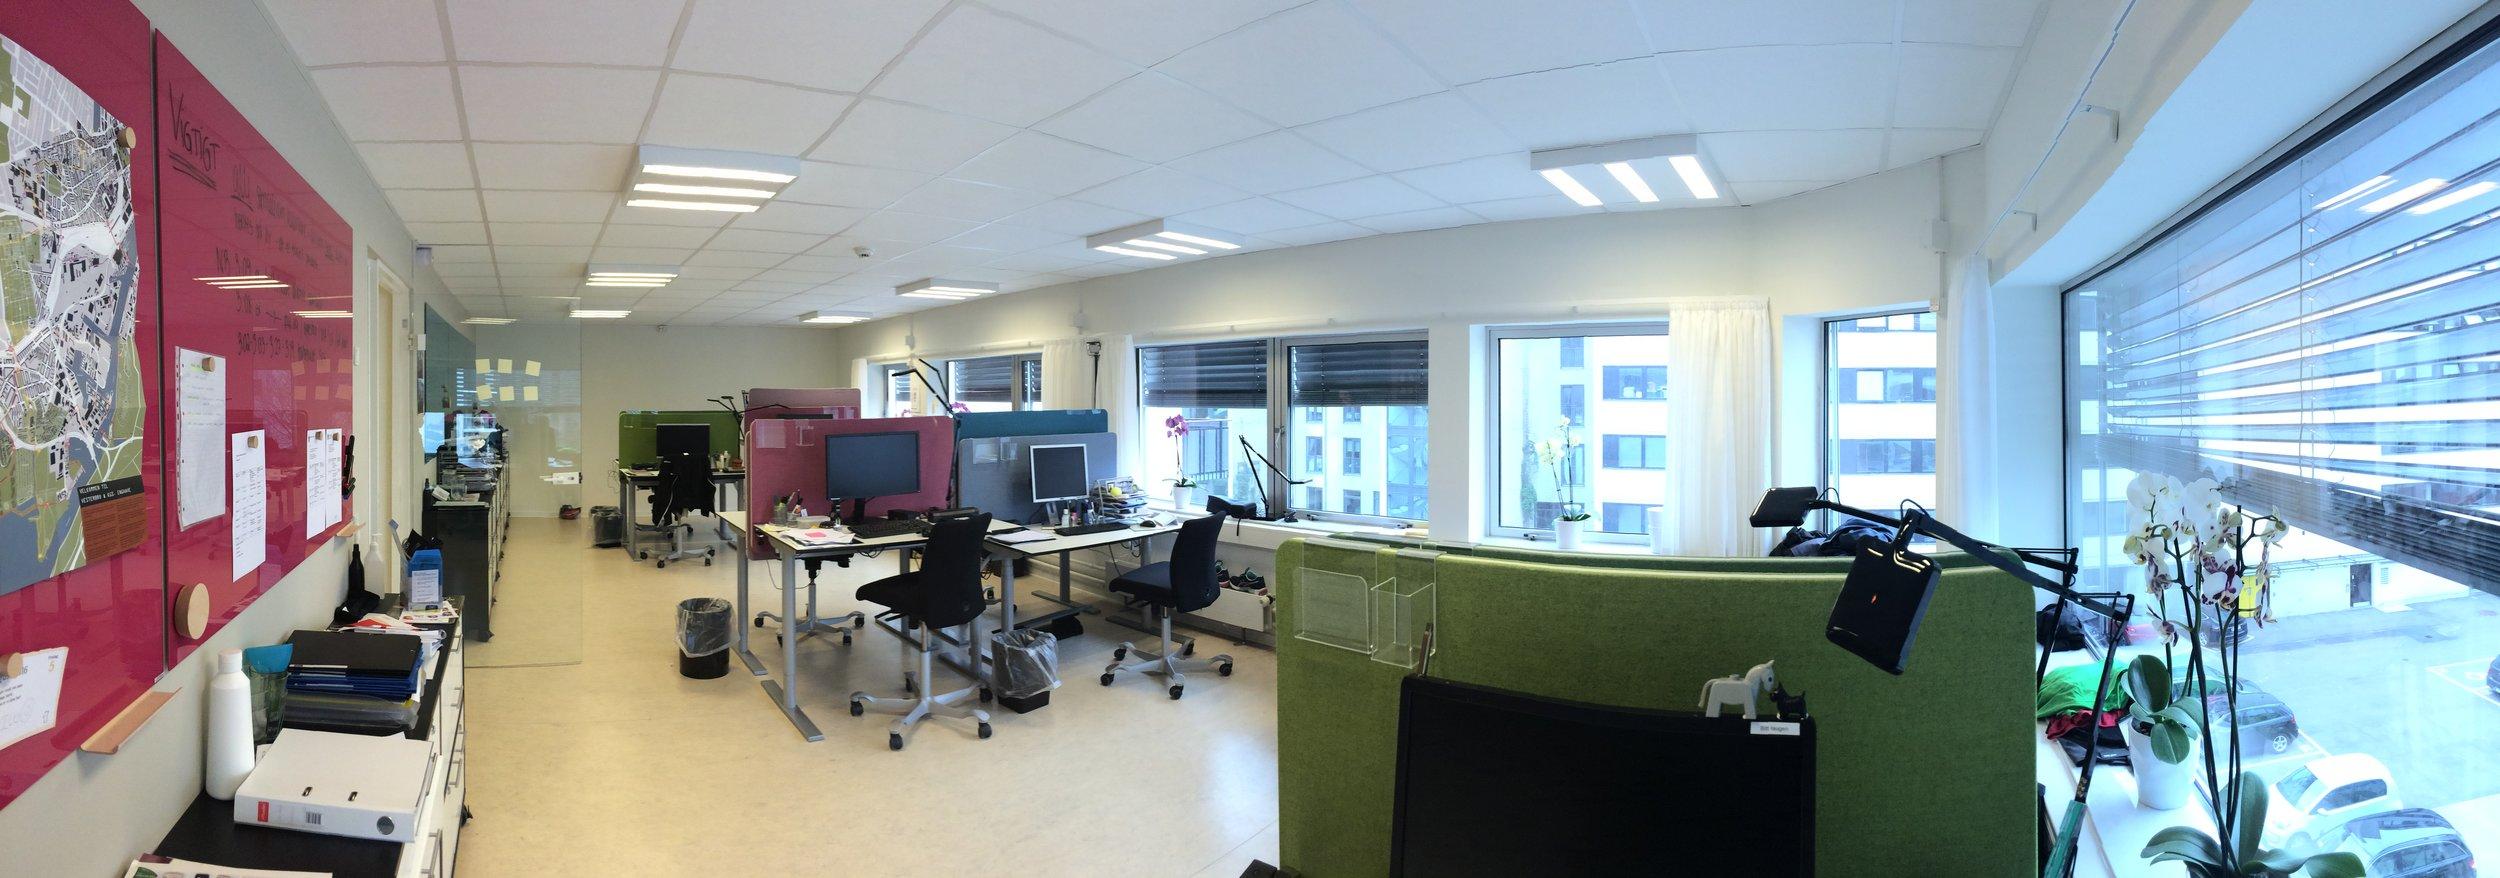 Vesterbro Sundh hus_Center f Diabetes_Kontor.JPG